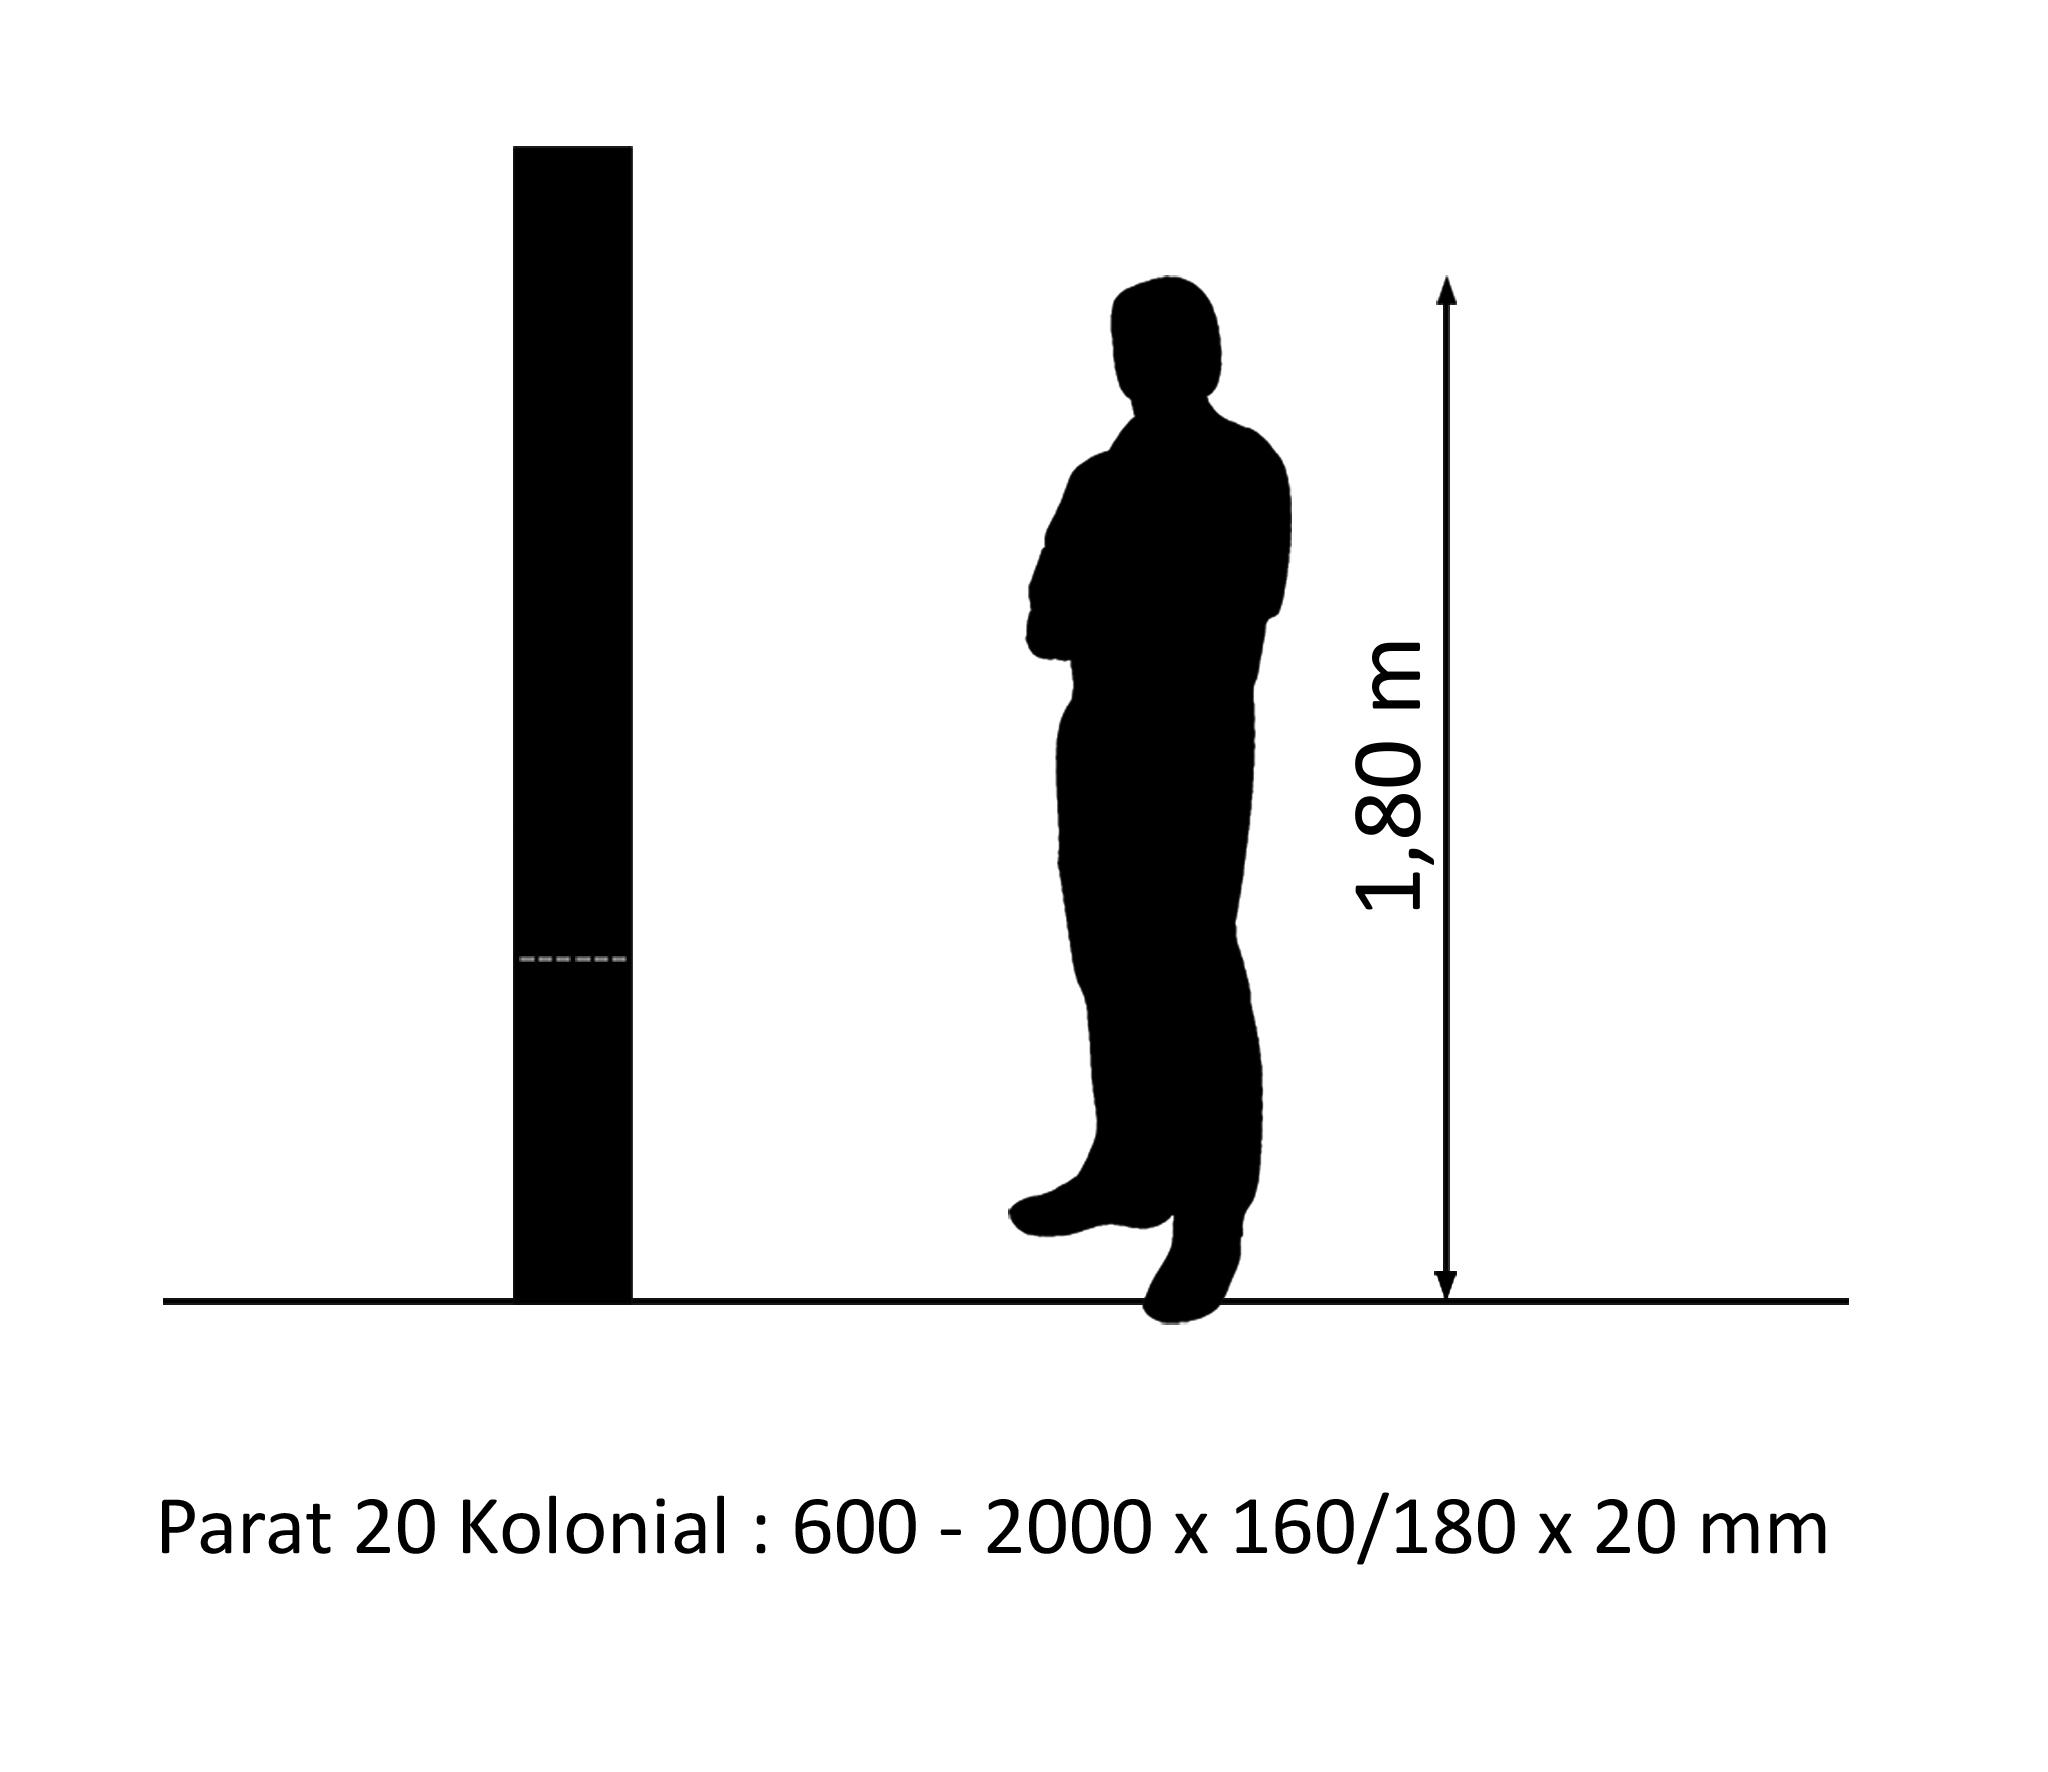 PARAT 20 kolonial oak Barrique 20mm